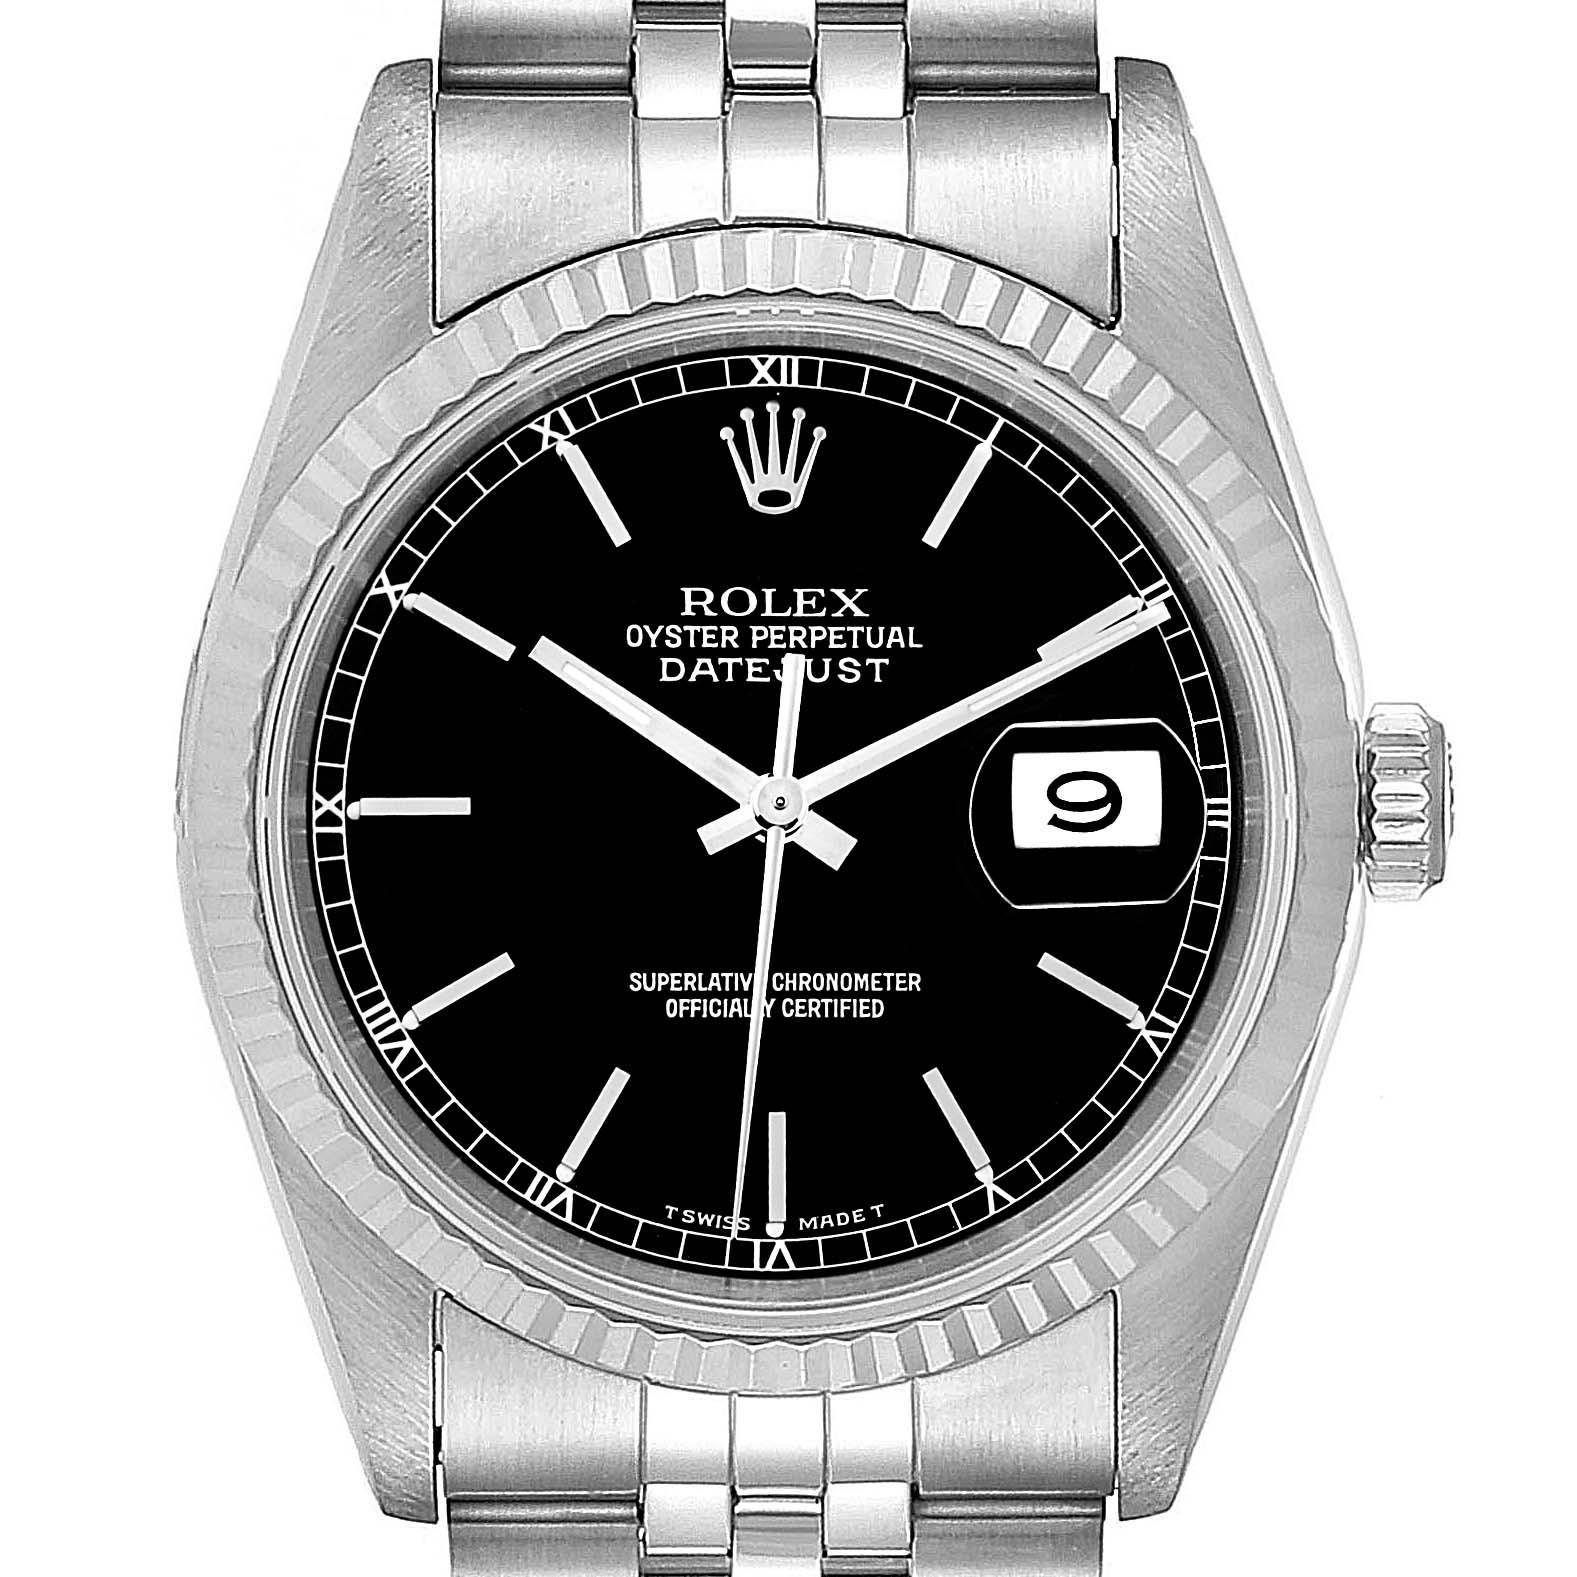 Rolex Datejust 36 Steel White Gold Black Dial Mens Watch 16234